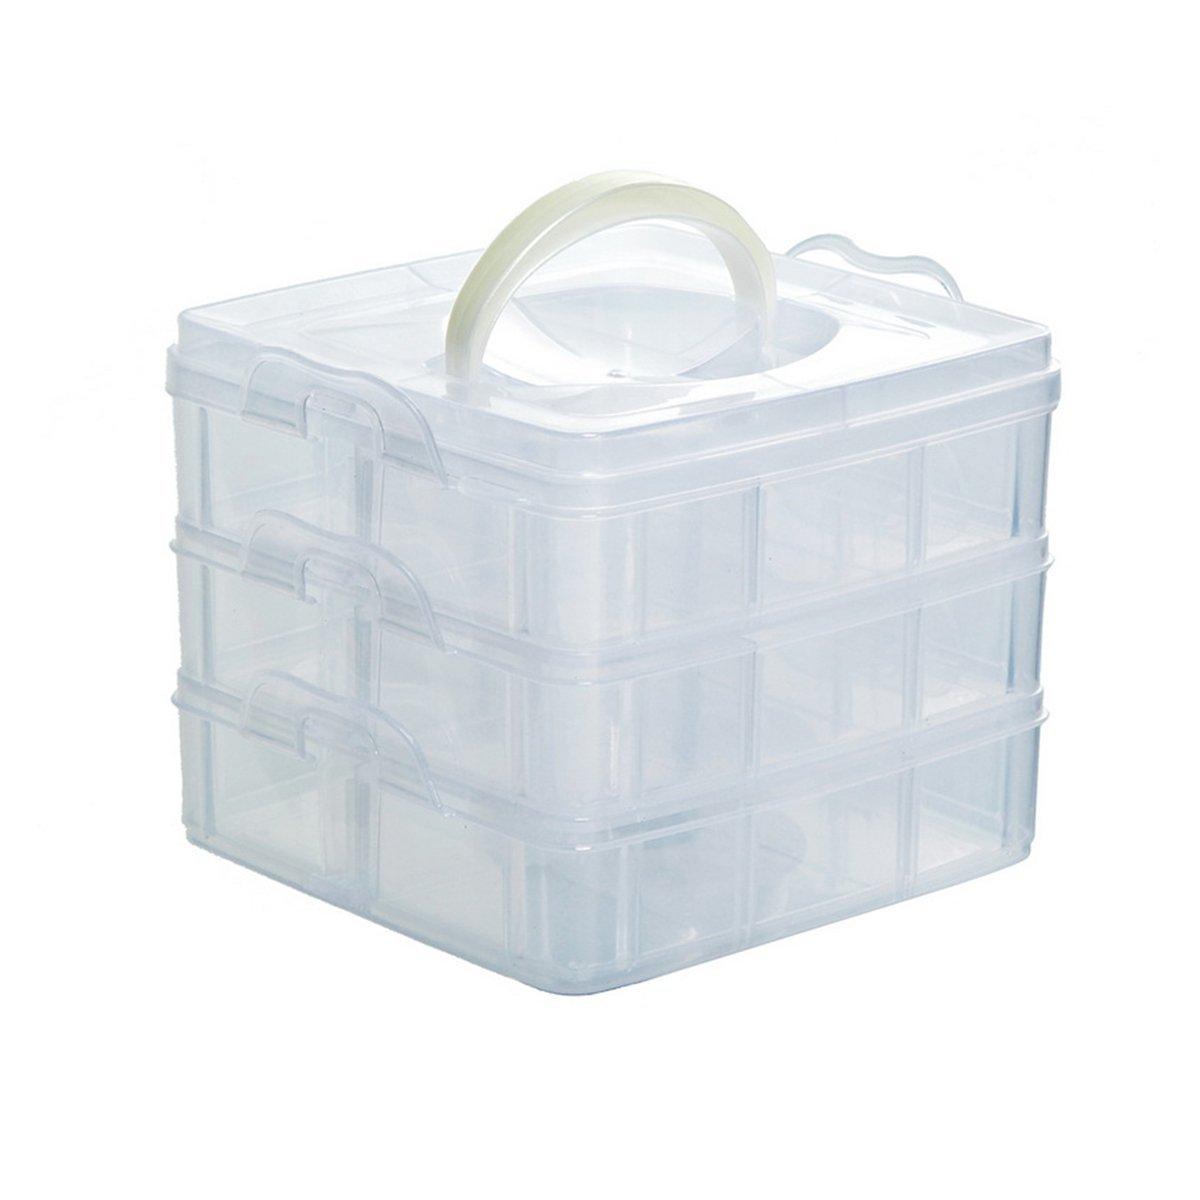 Amazon.com Housweety Transparent Storage Box Sewing Thread Bobbins Holder Needlecraft Organizer with 18 Compartments  sc 1 st  Amazon.com & Amazon.com: Housweety Transparent Storage Box Sewing Thread Bobbins ...